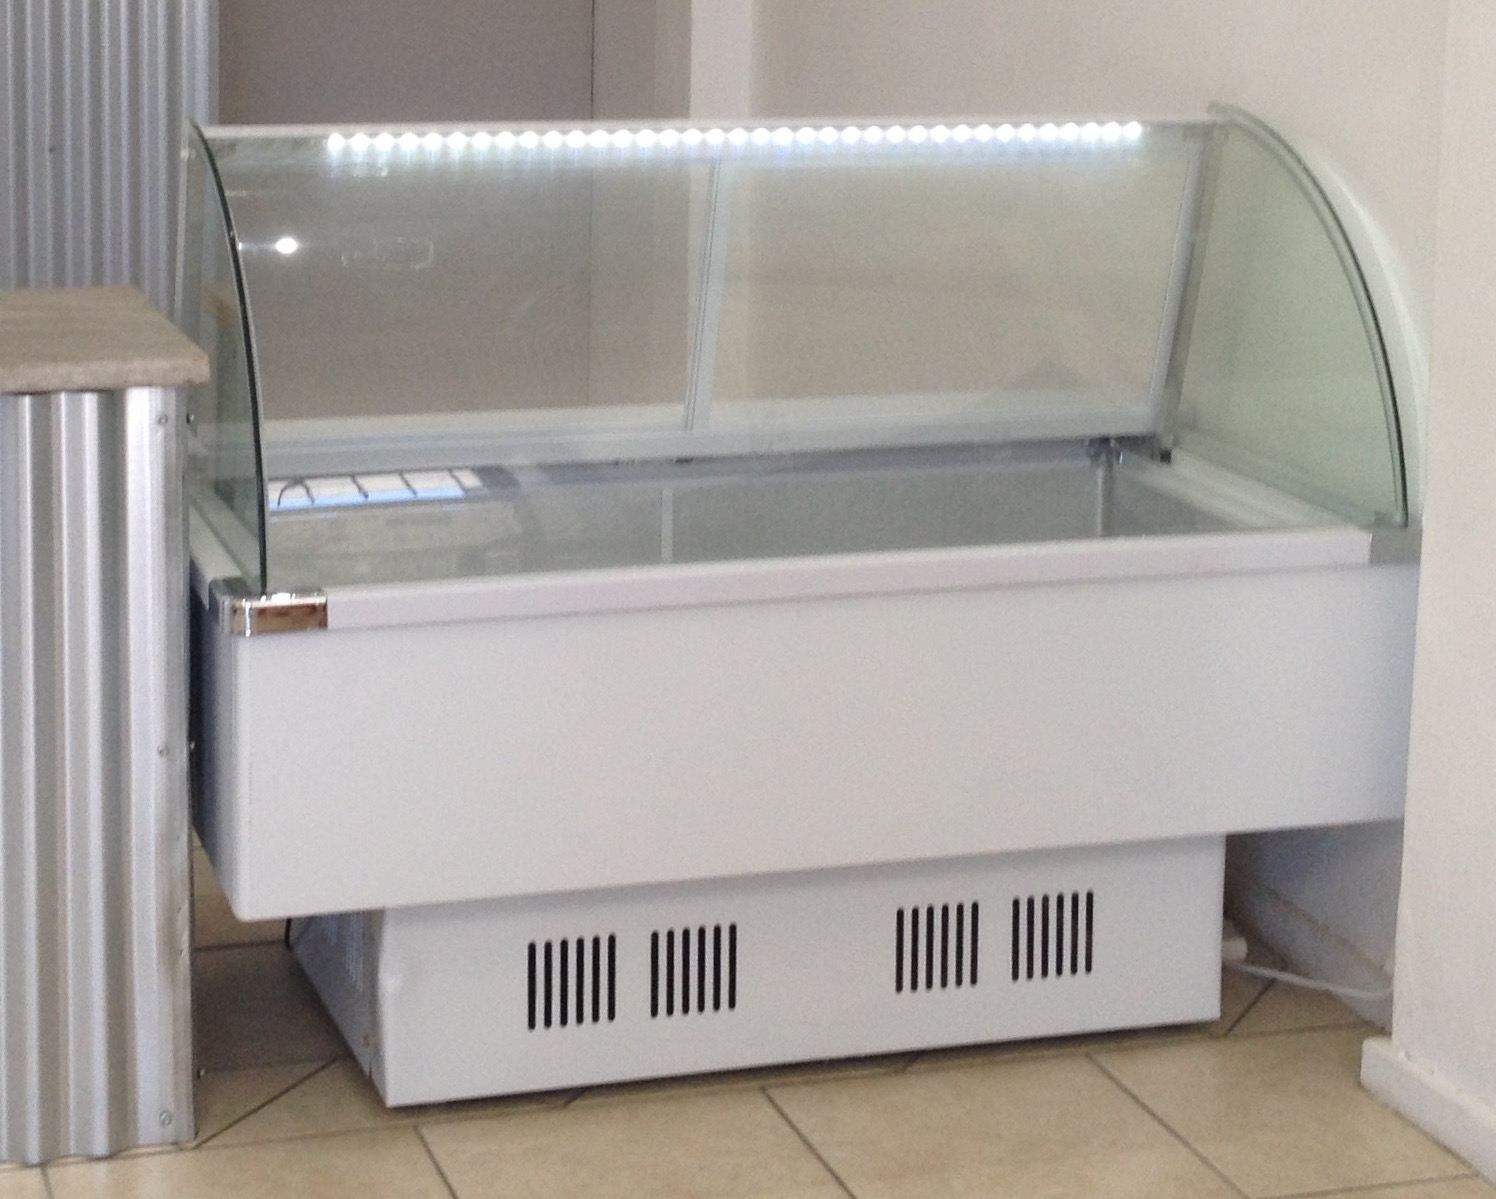 Display fridge/ freezer as new